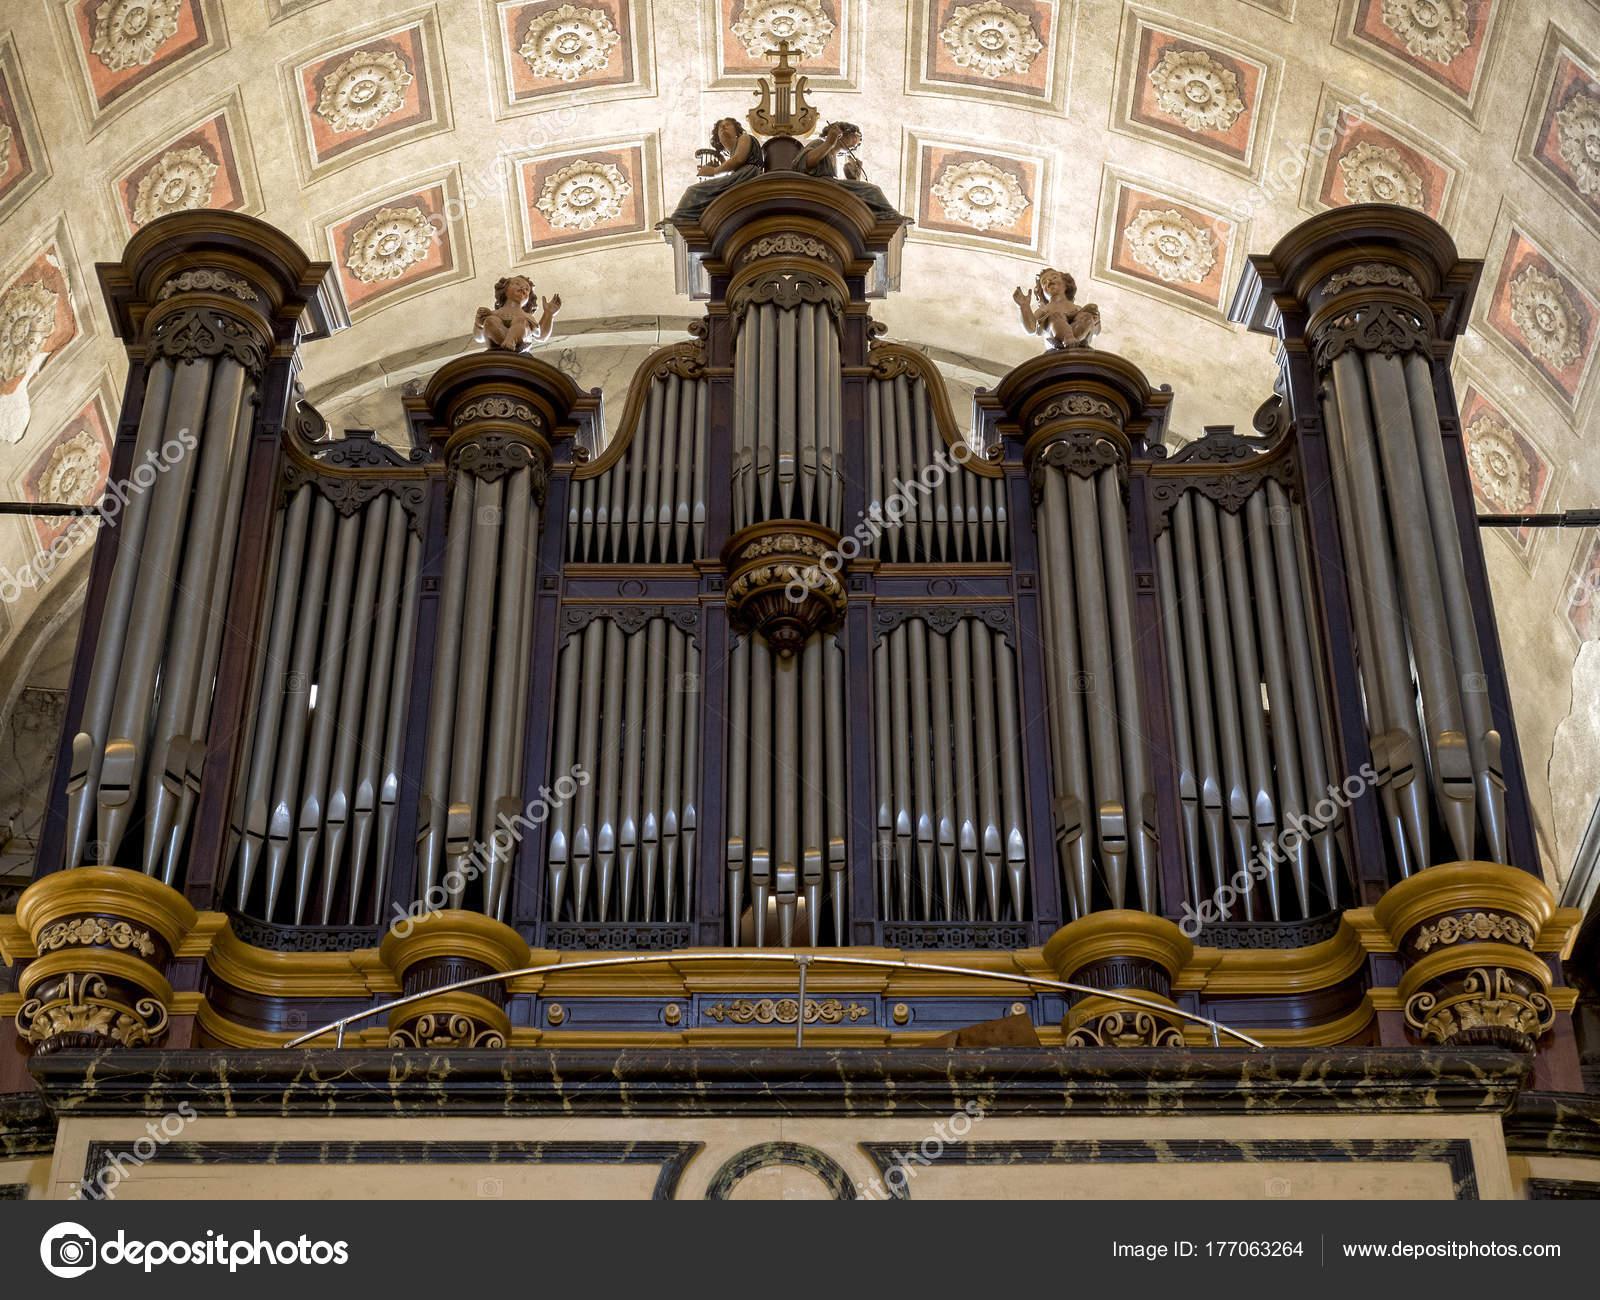 Orgel kathedrale von ajaccio redaktionelles stockfoto for Decor 2000 ajaccio horaires